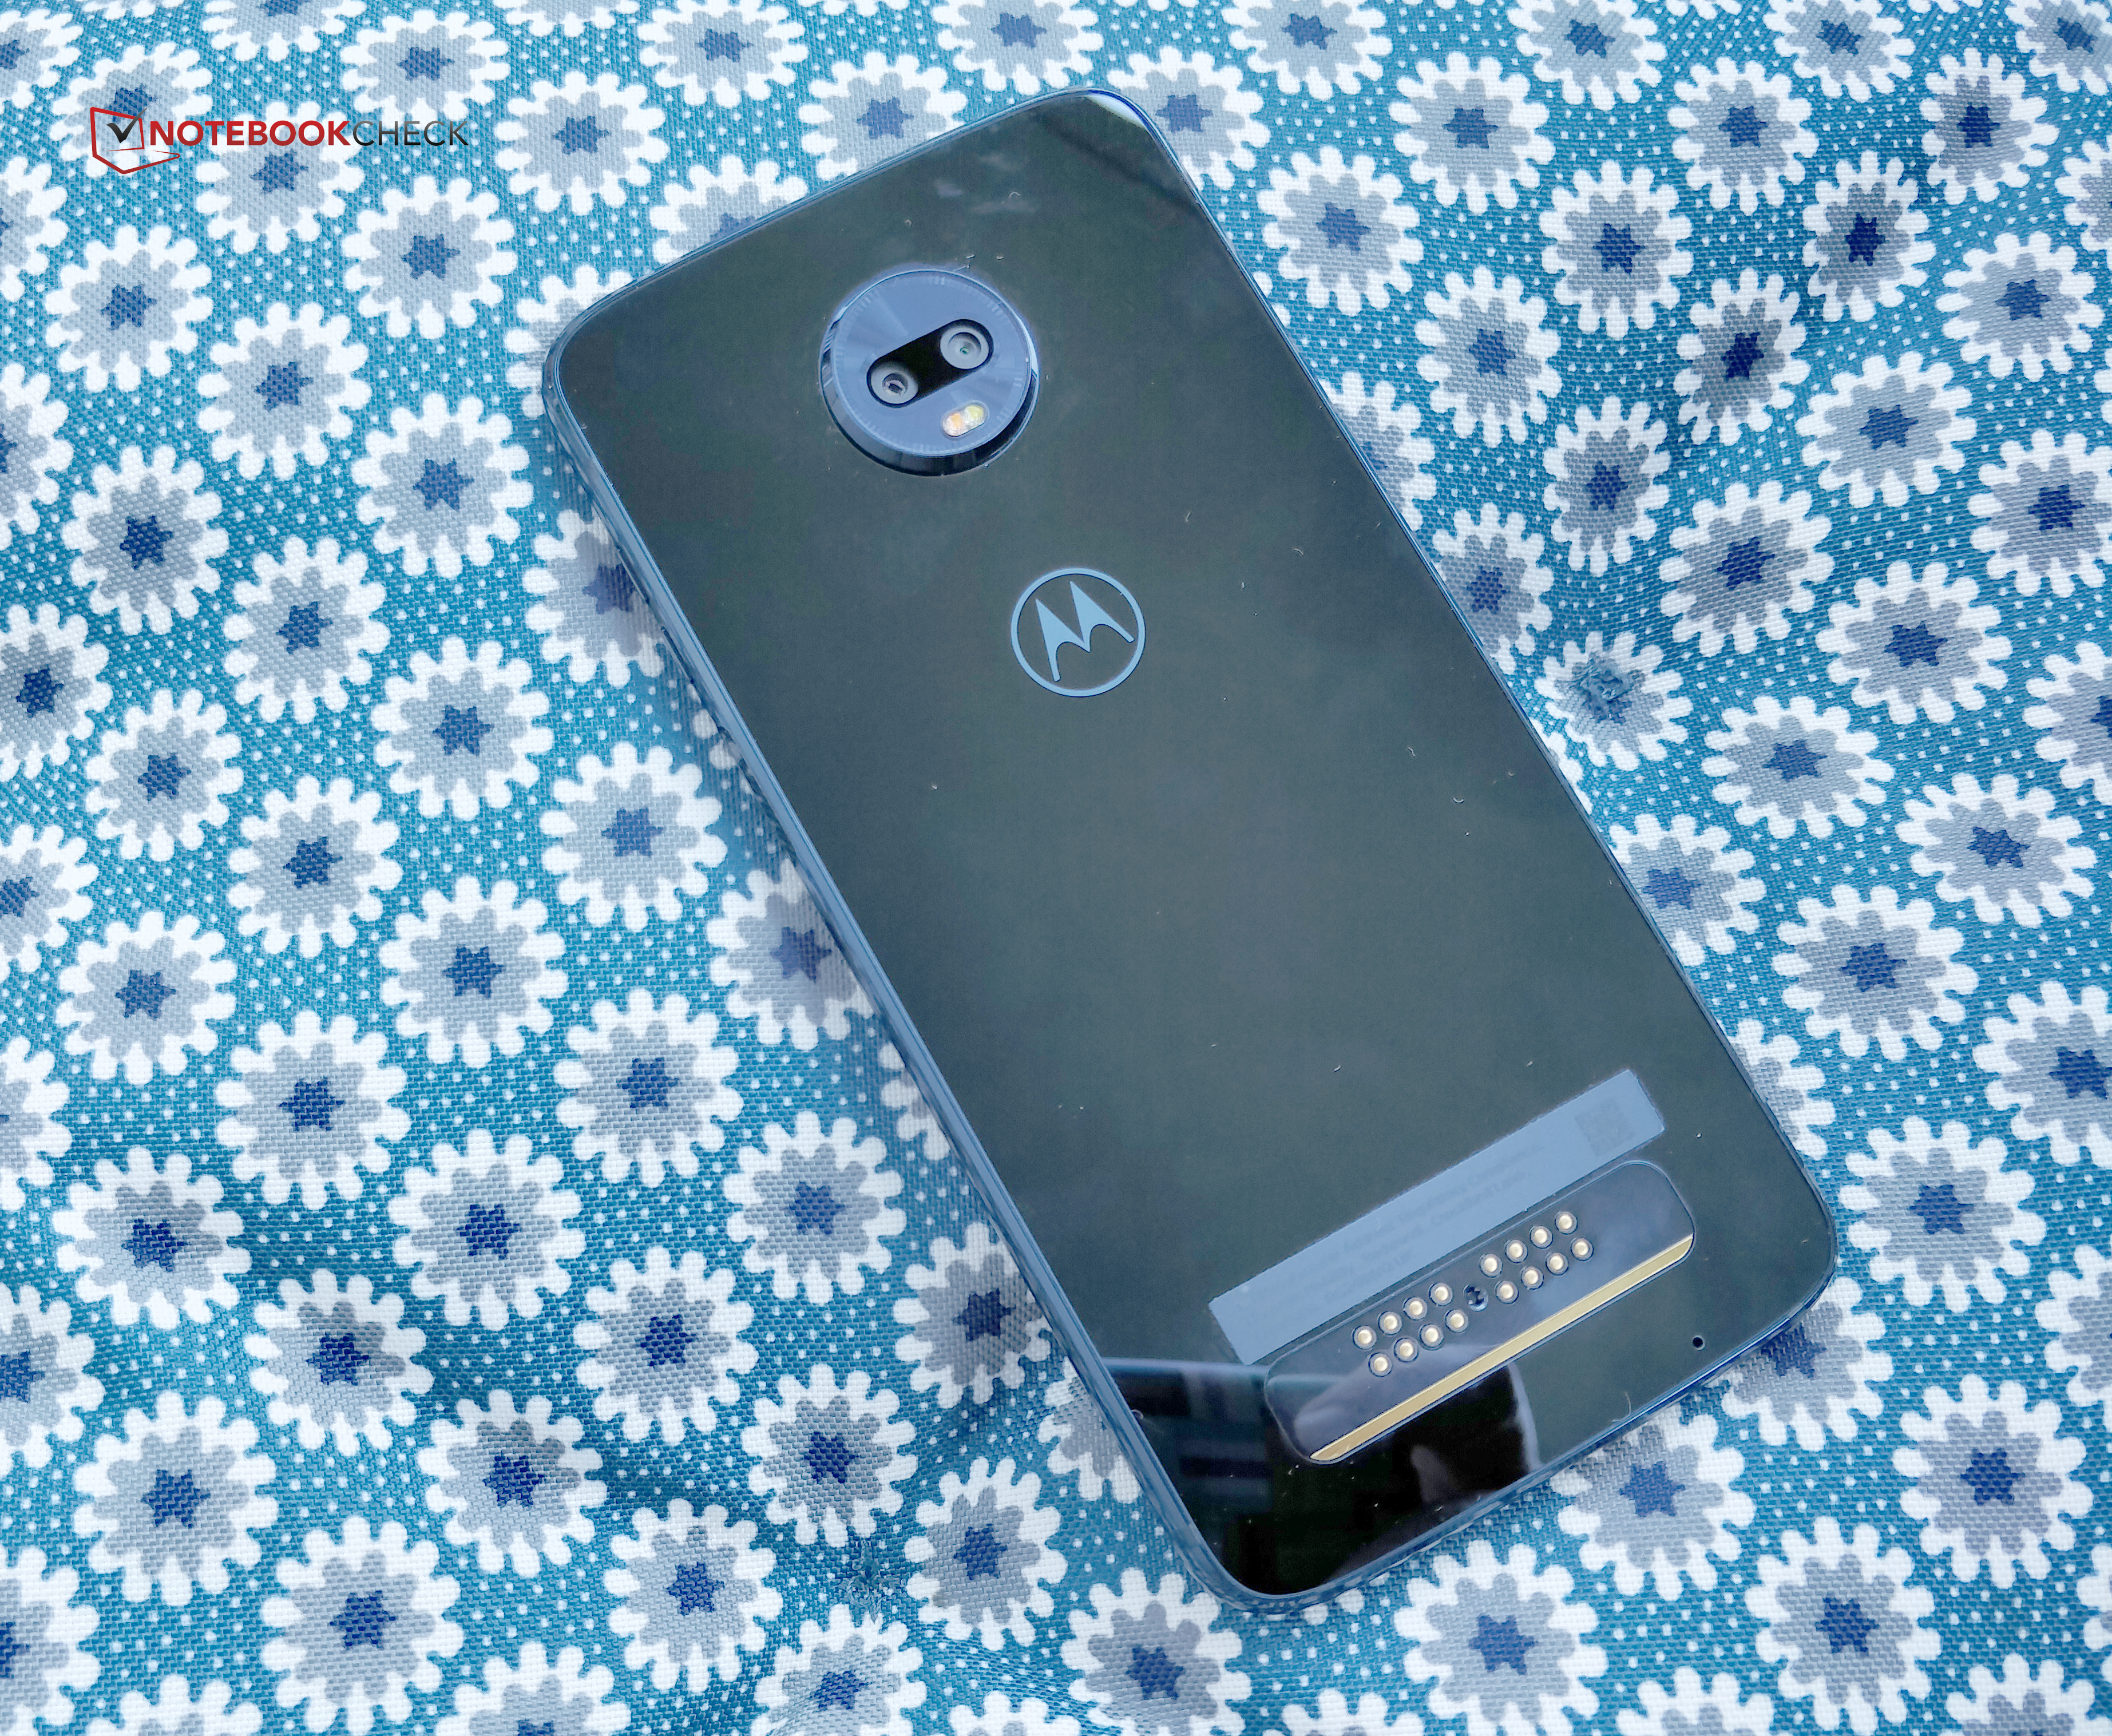 Motorola Moto Z3 Play Smartphone Review - NotebookCheck.net Reviews